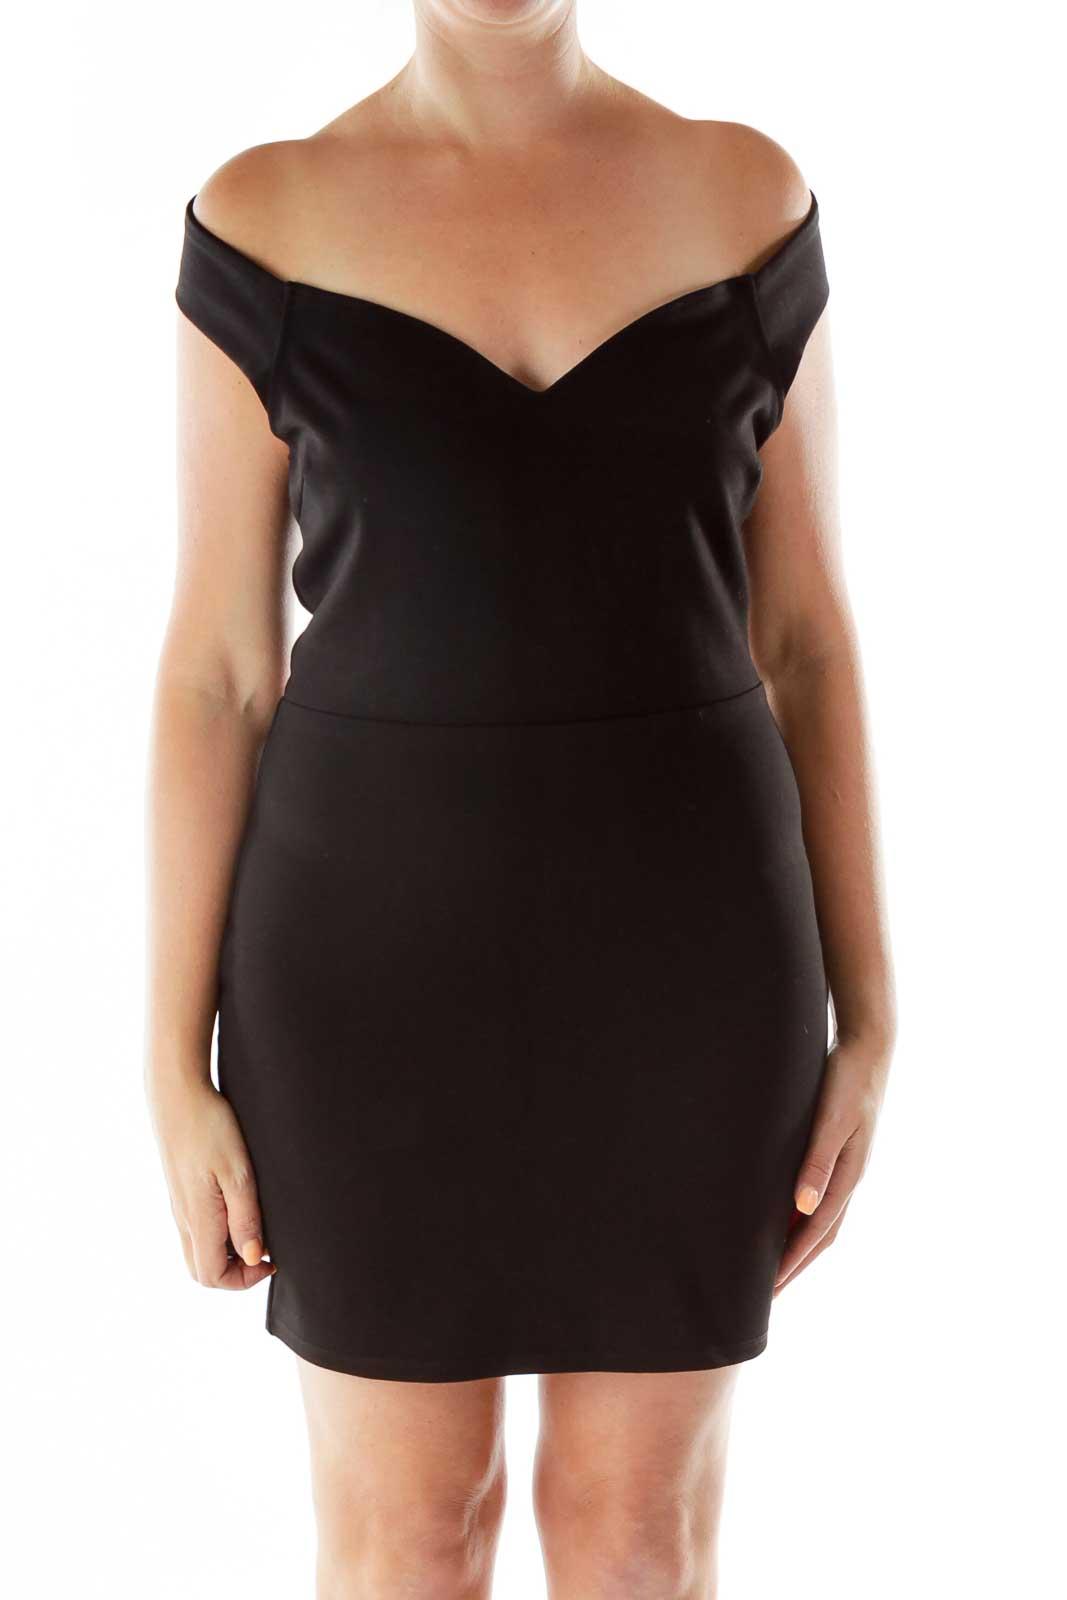 Black Open-Back A-line Cocktail Dress Front